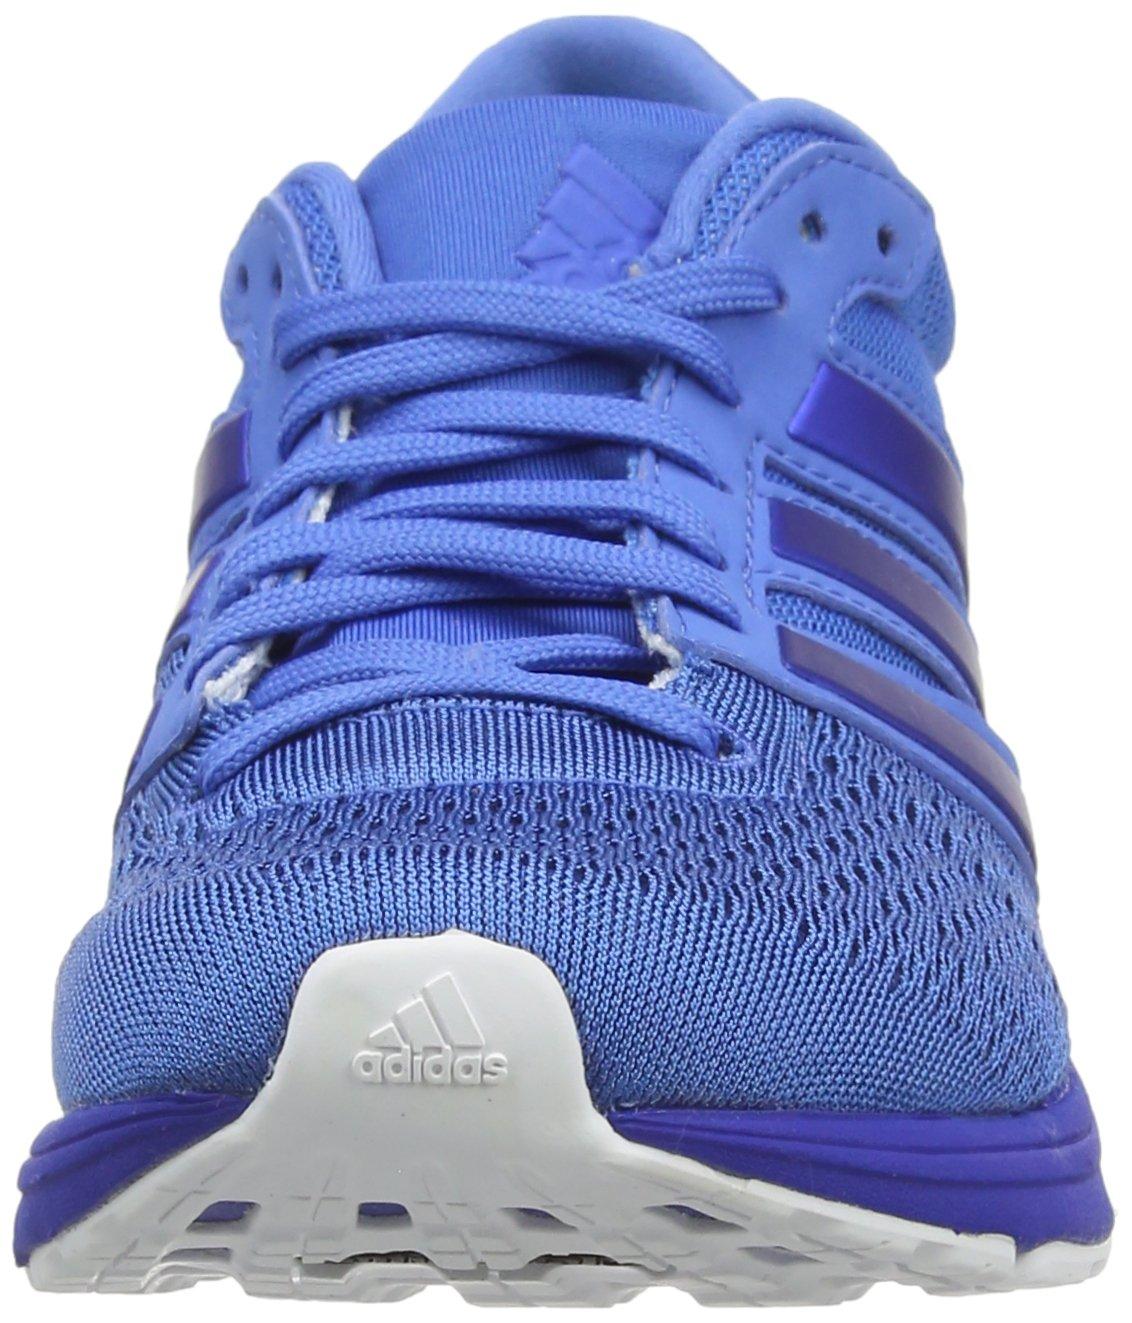 71D8ny0EfyL - adidas Women's Adizero Boston 6 Competition Running Shoes